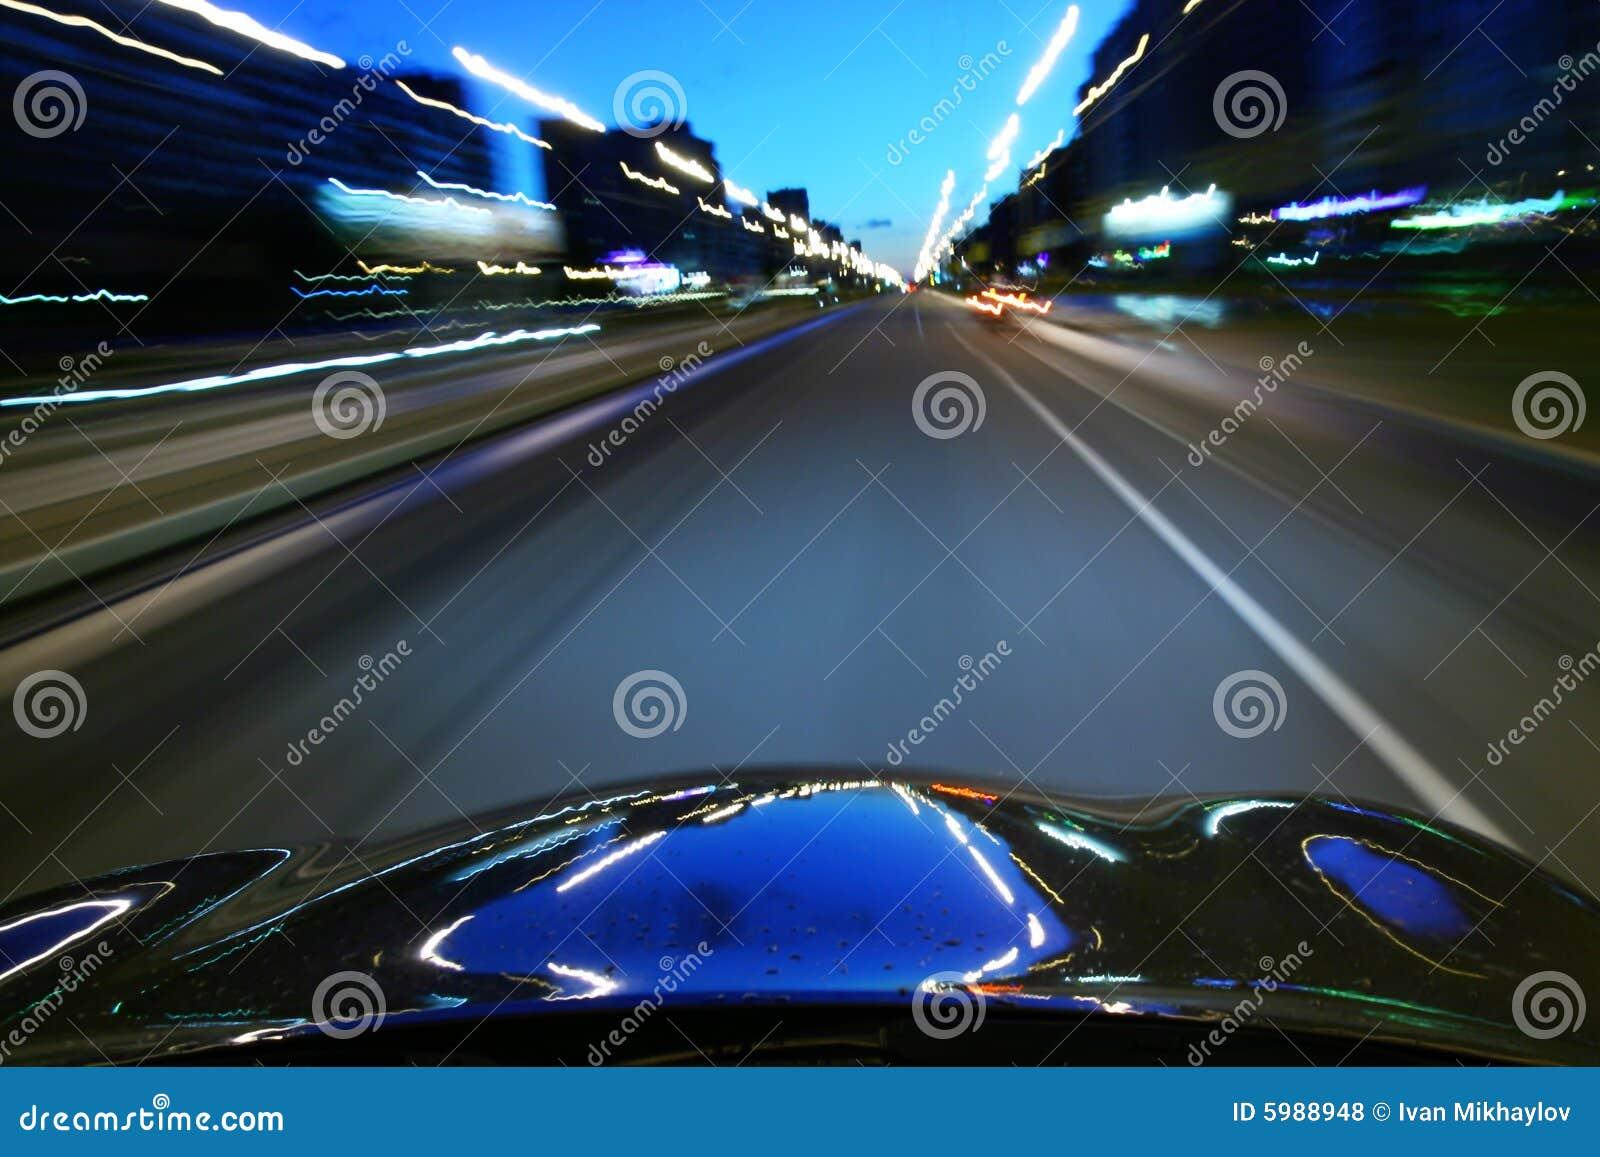 Drive speed